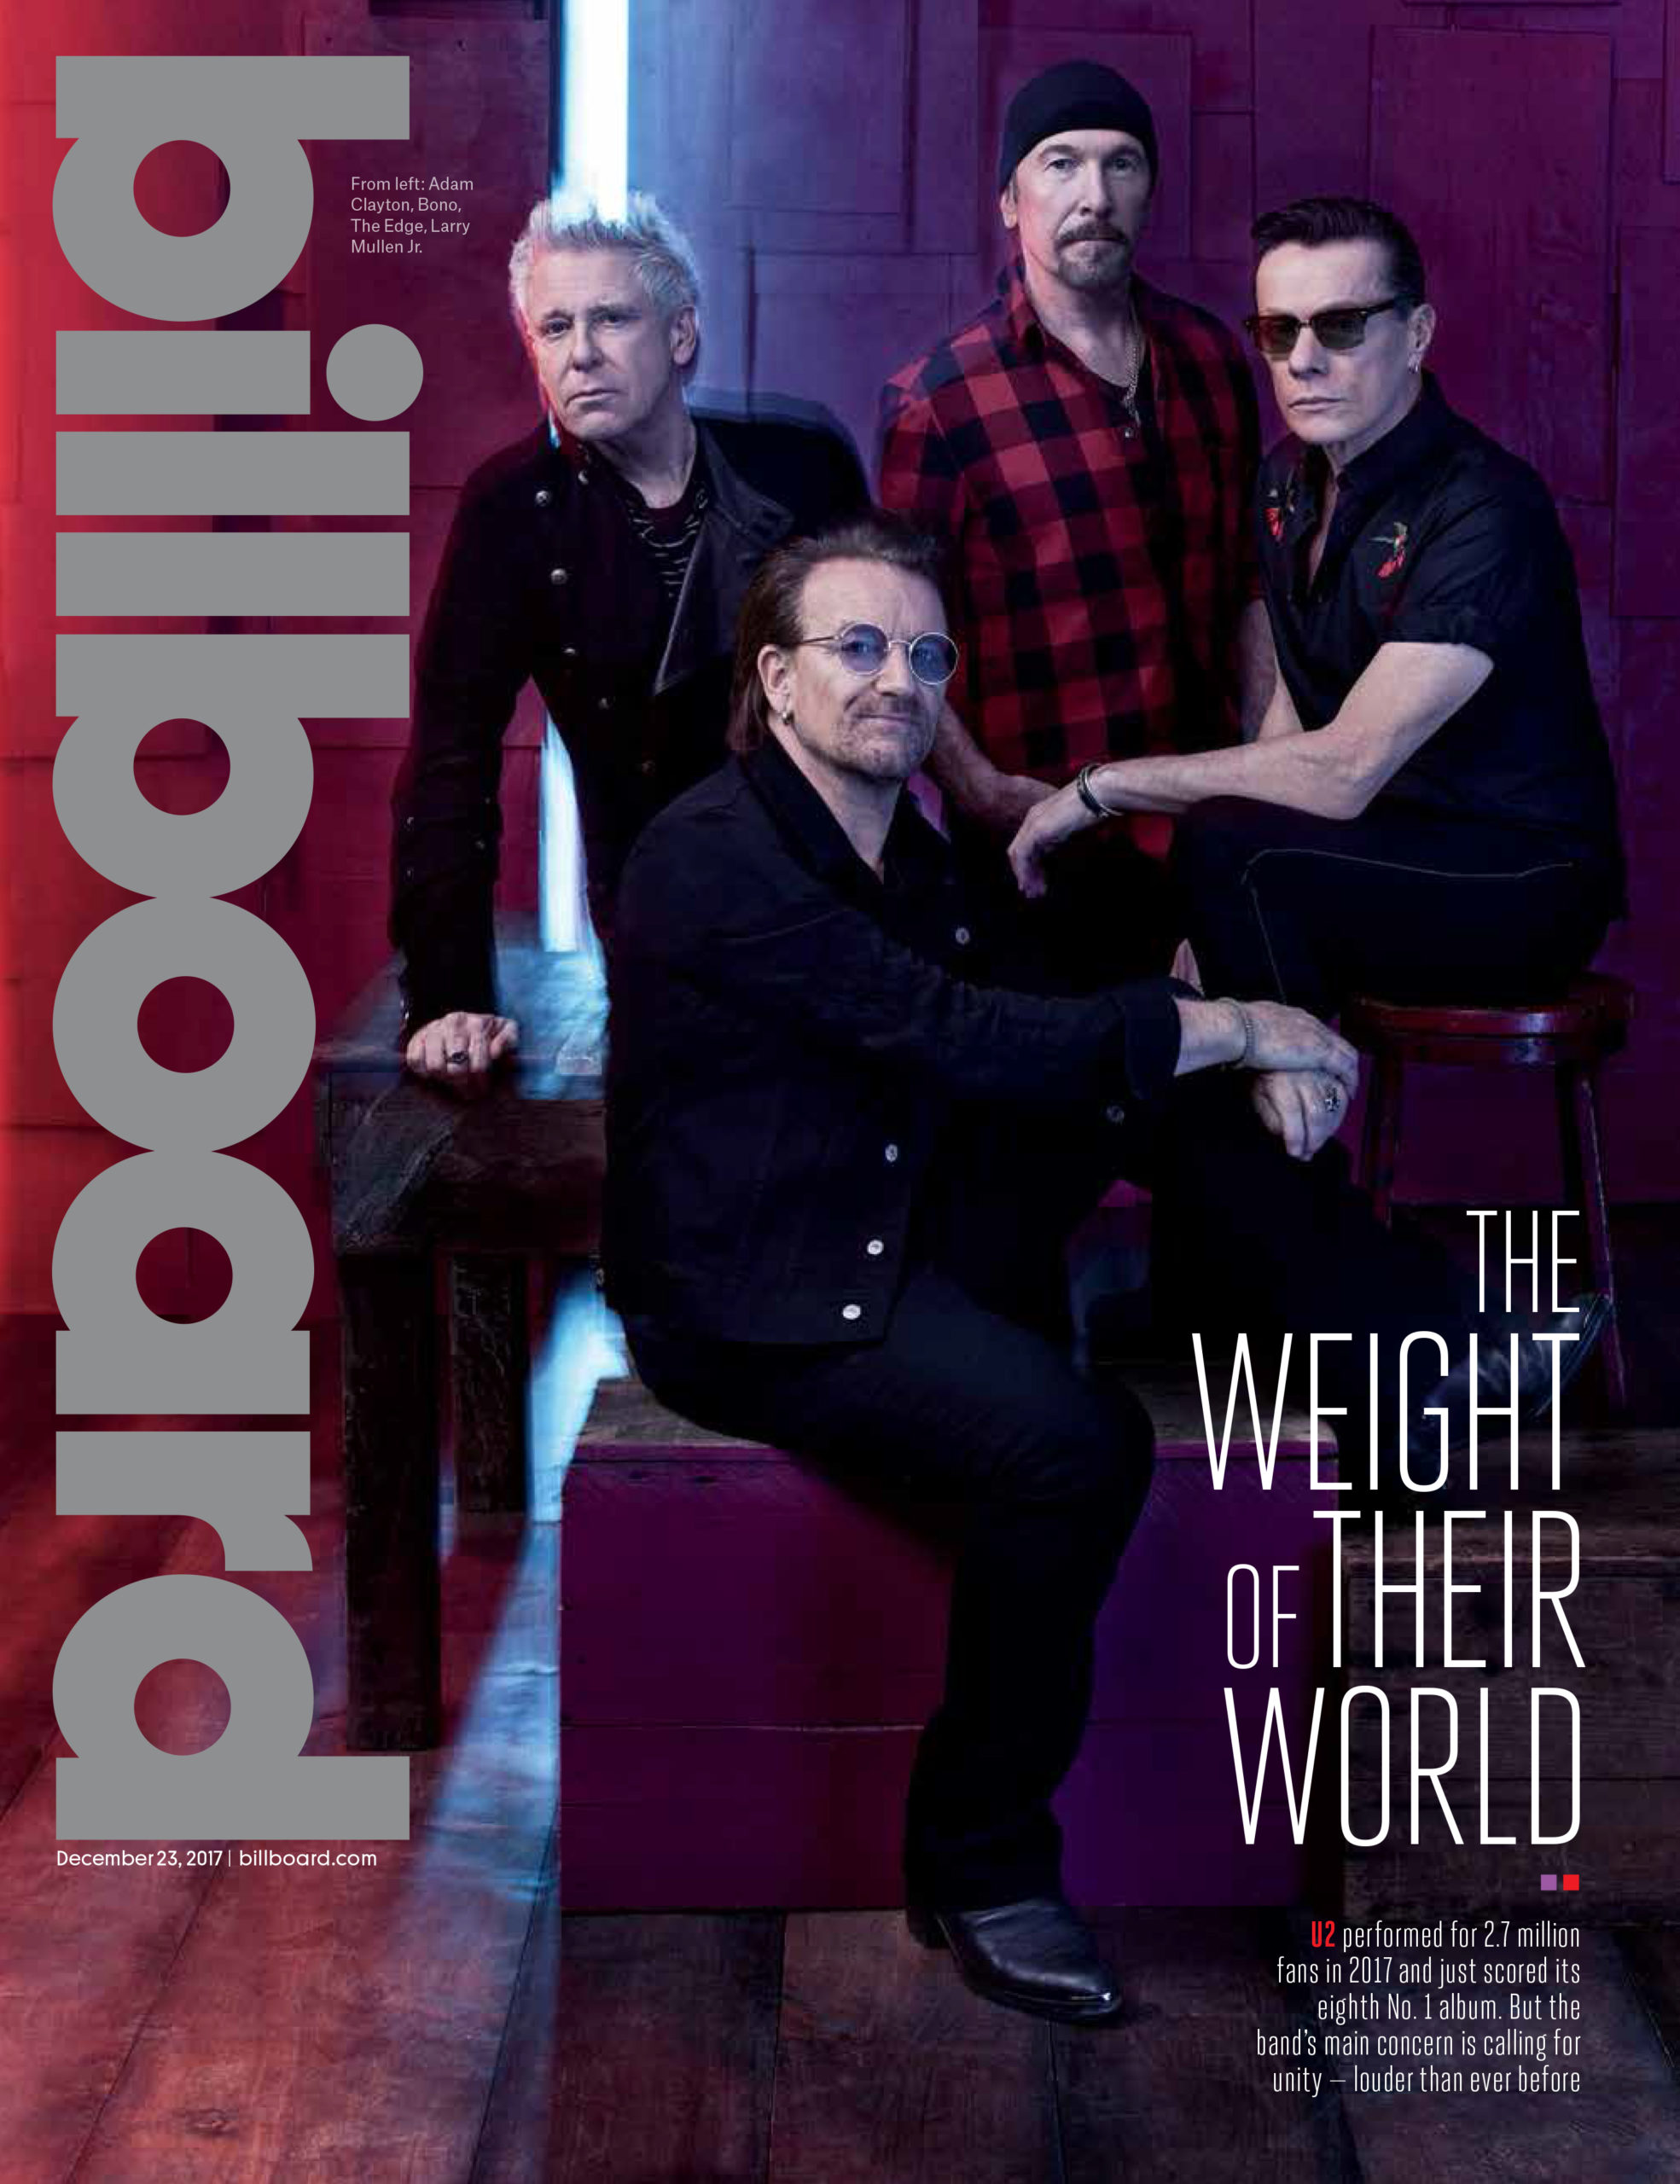 The Daily Edit - Billboard: Joe Pugliese - A Photo EditorA